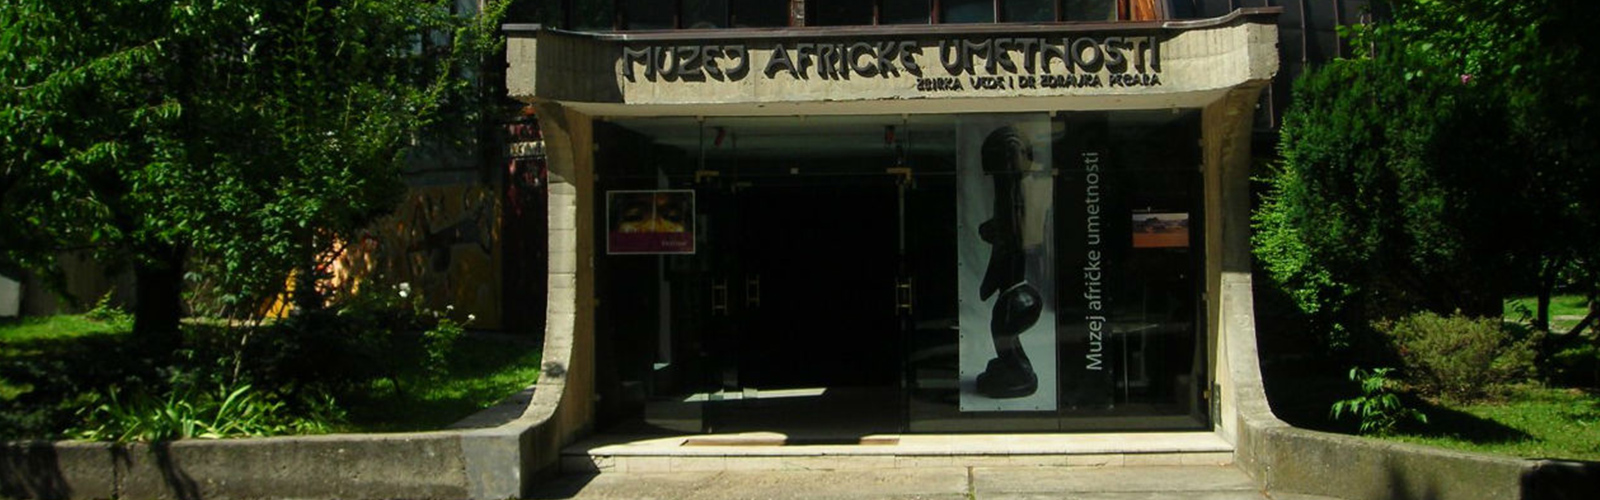 Conceirge Belgrade | Muzej africke umetnosti